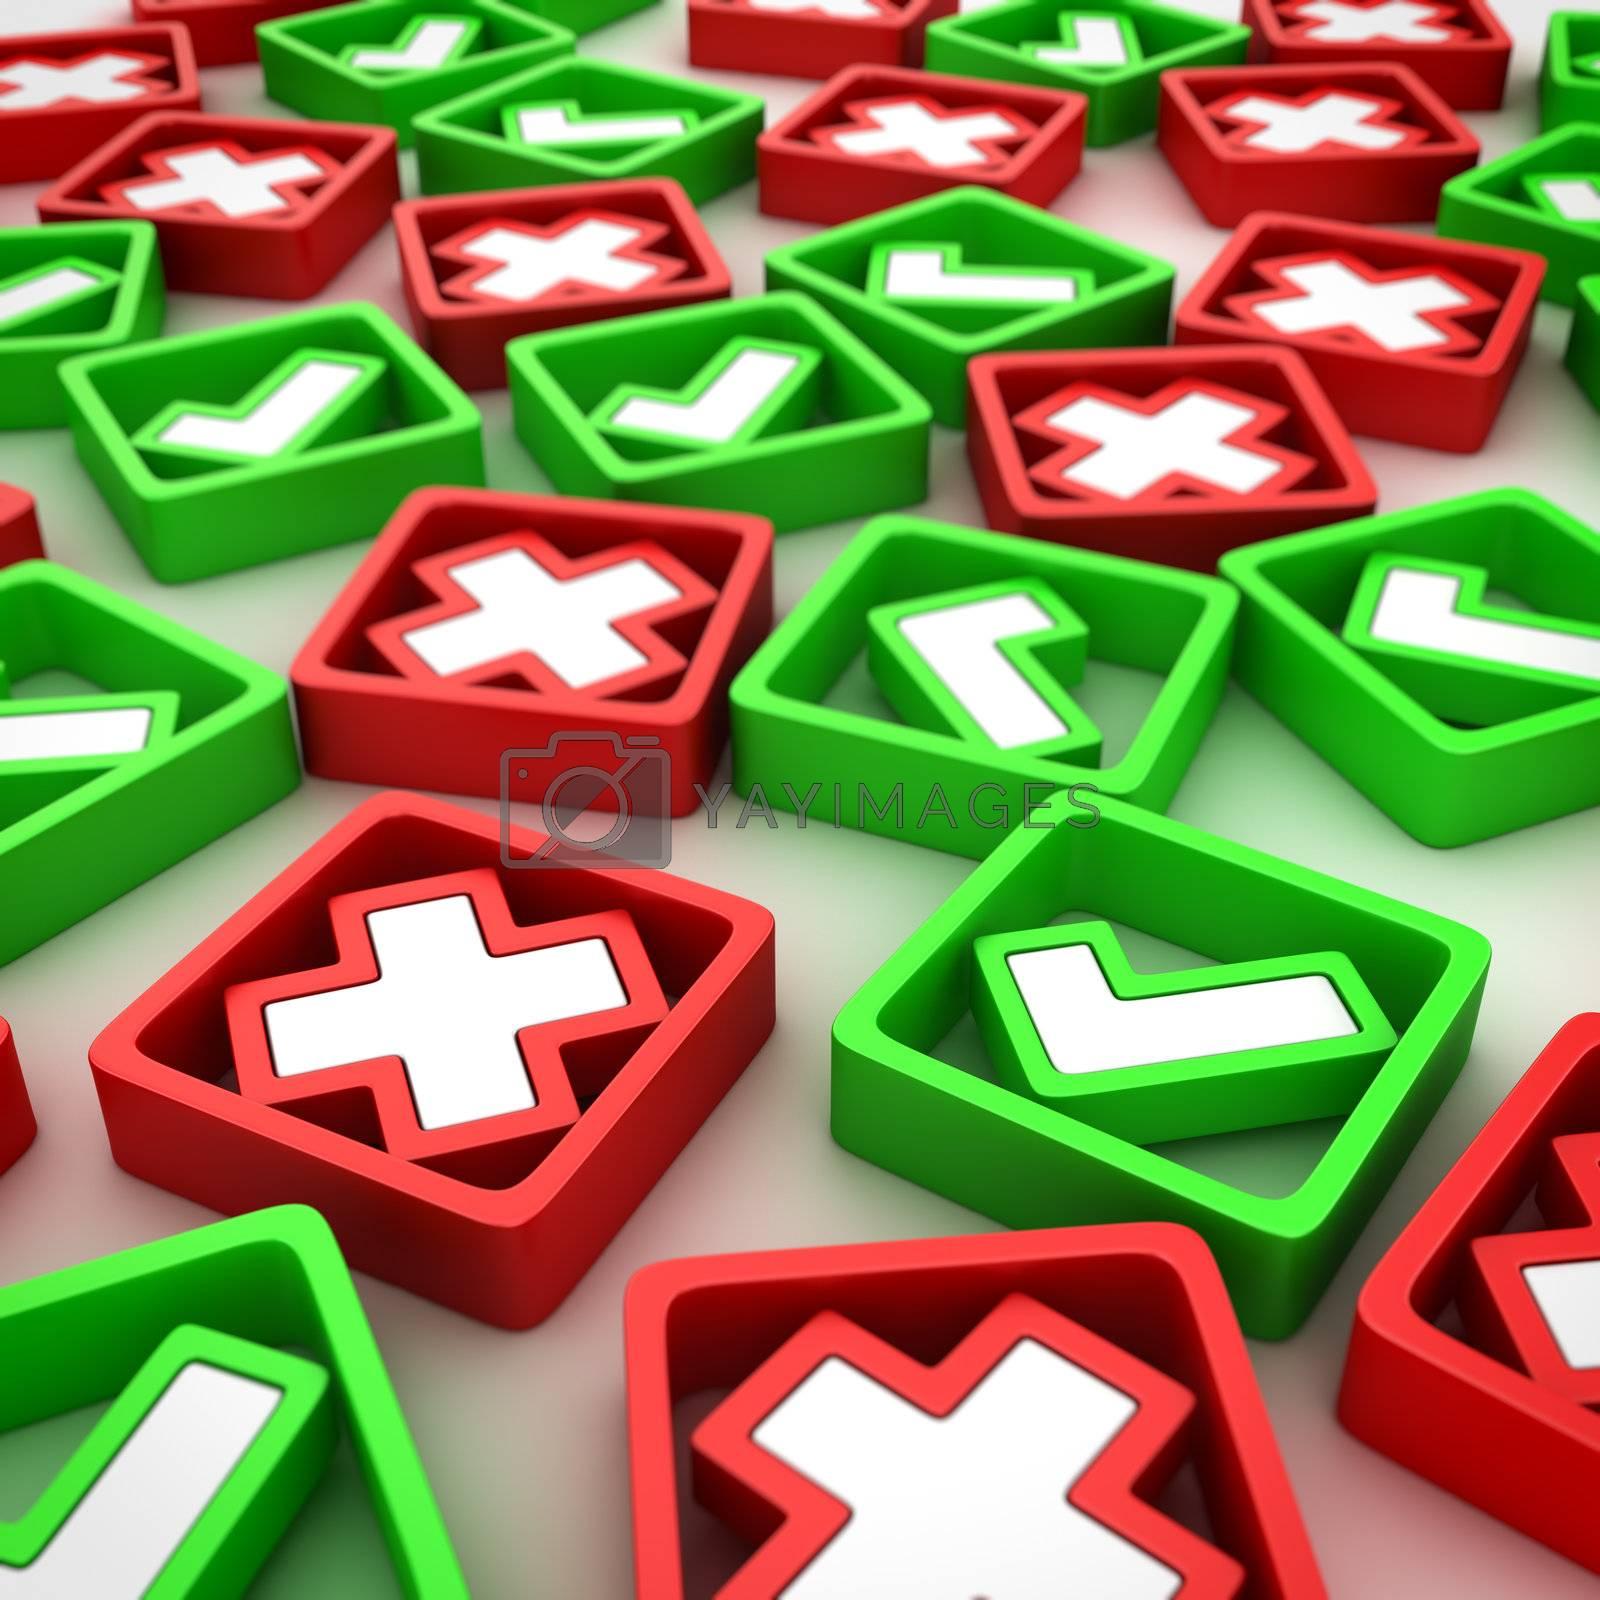 Random group of positive ticks and negative crosses